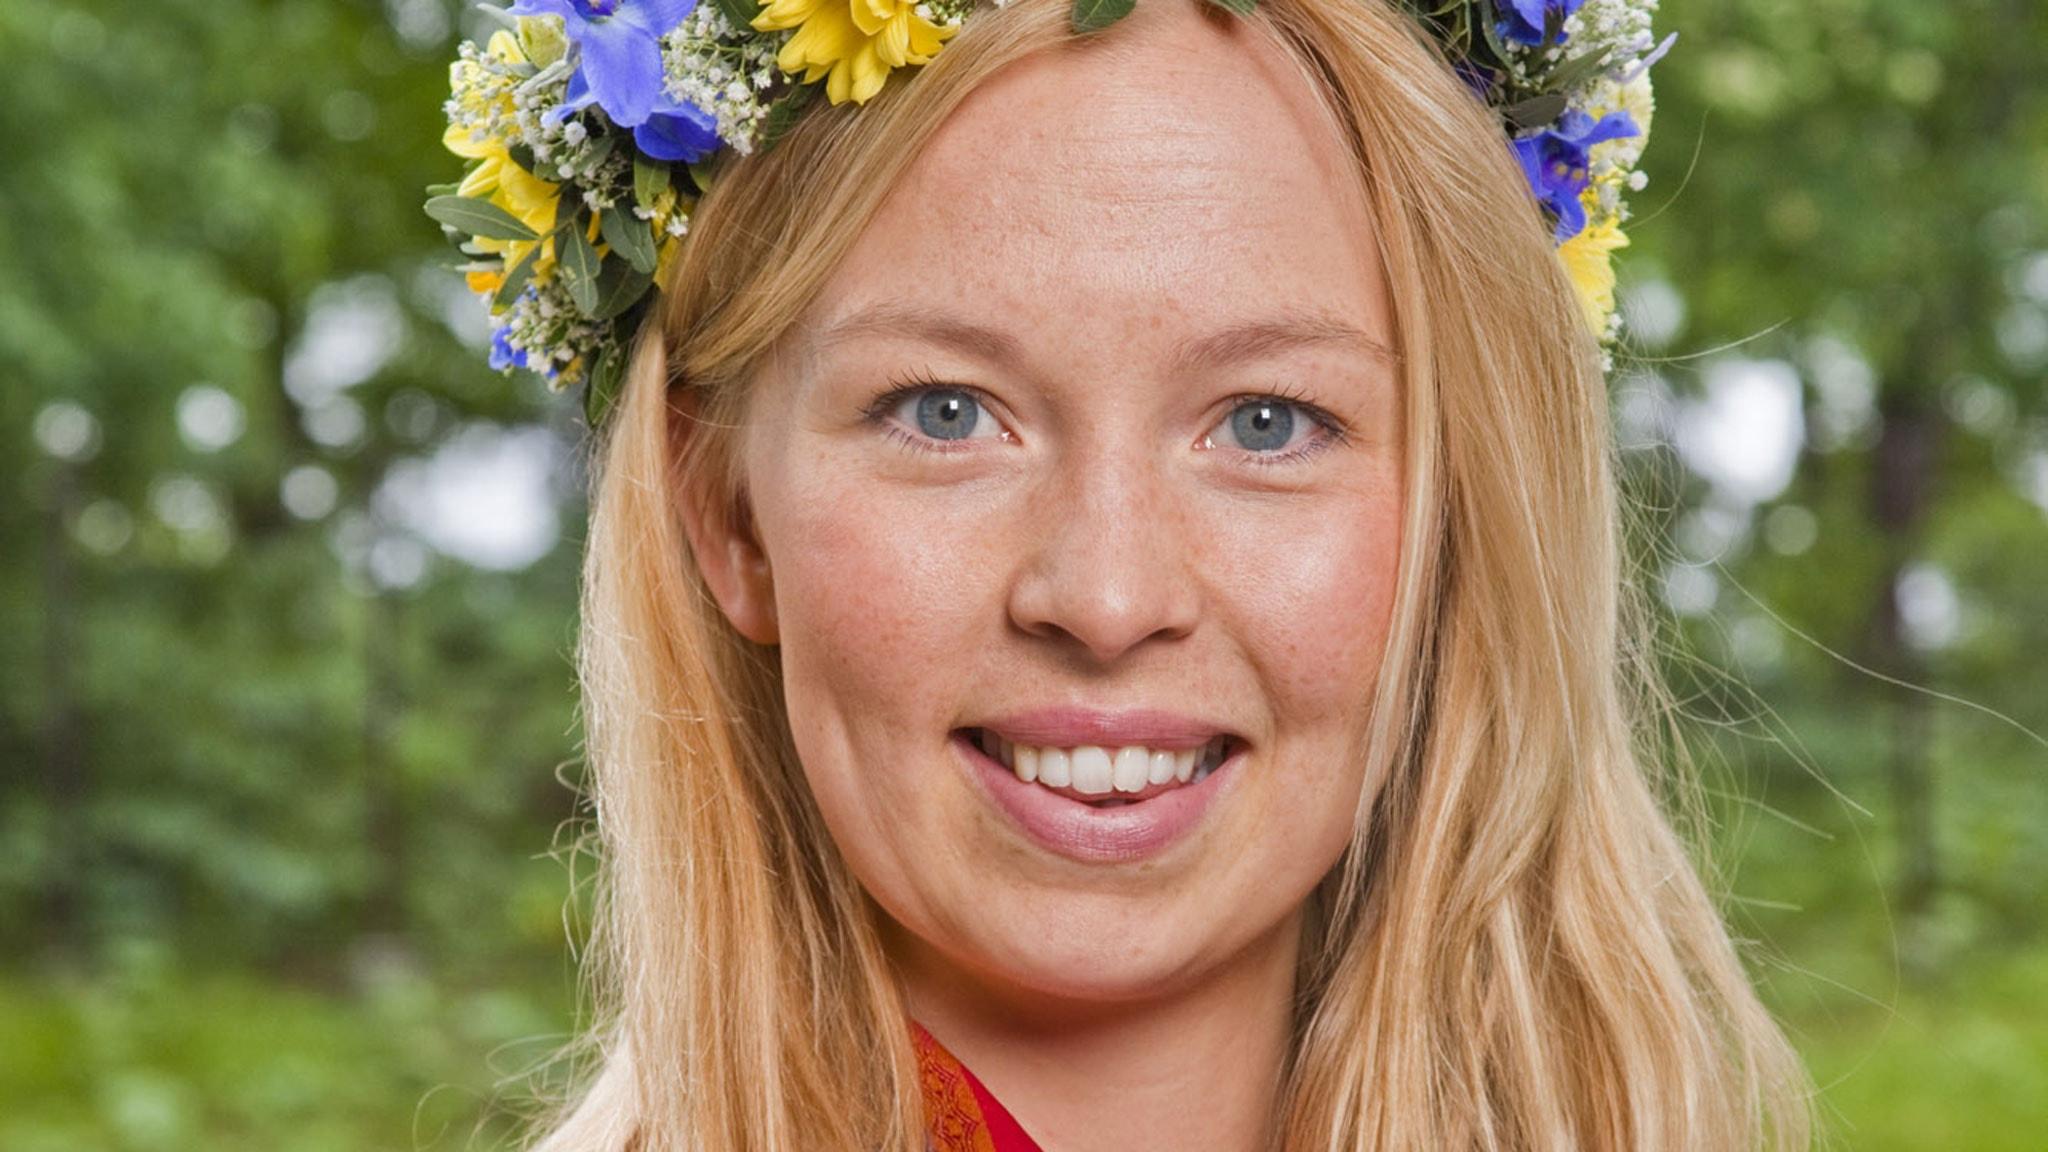 Sofia Jannok, foto: Mattias Ahlm/SR